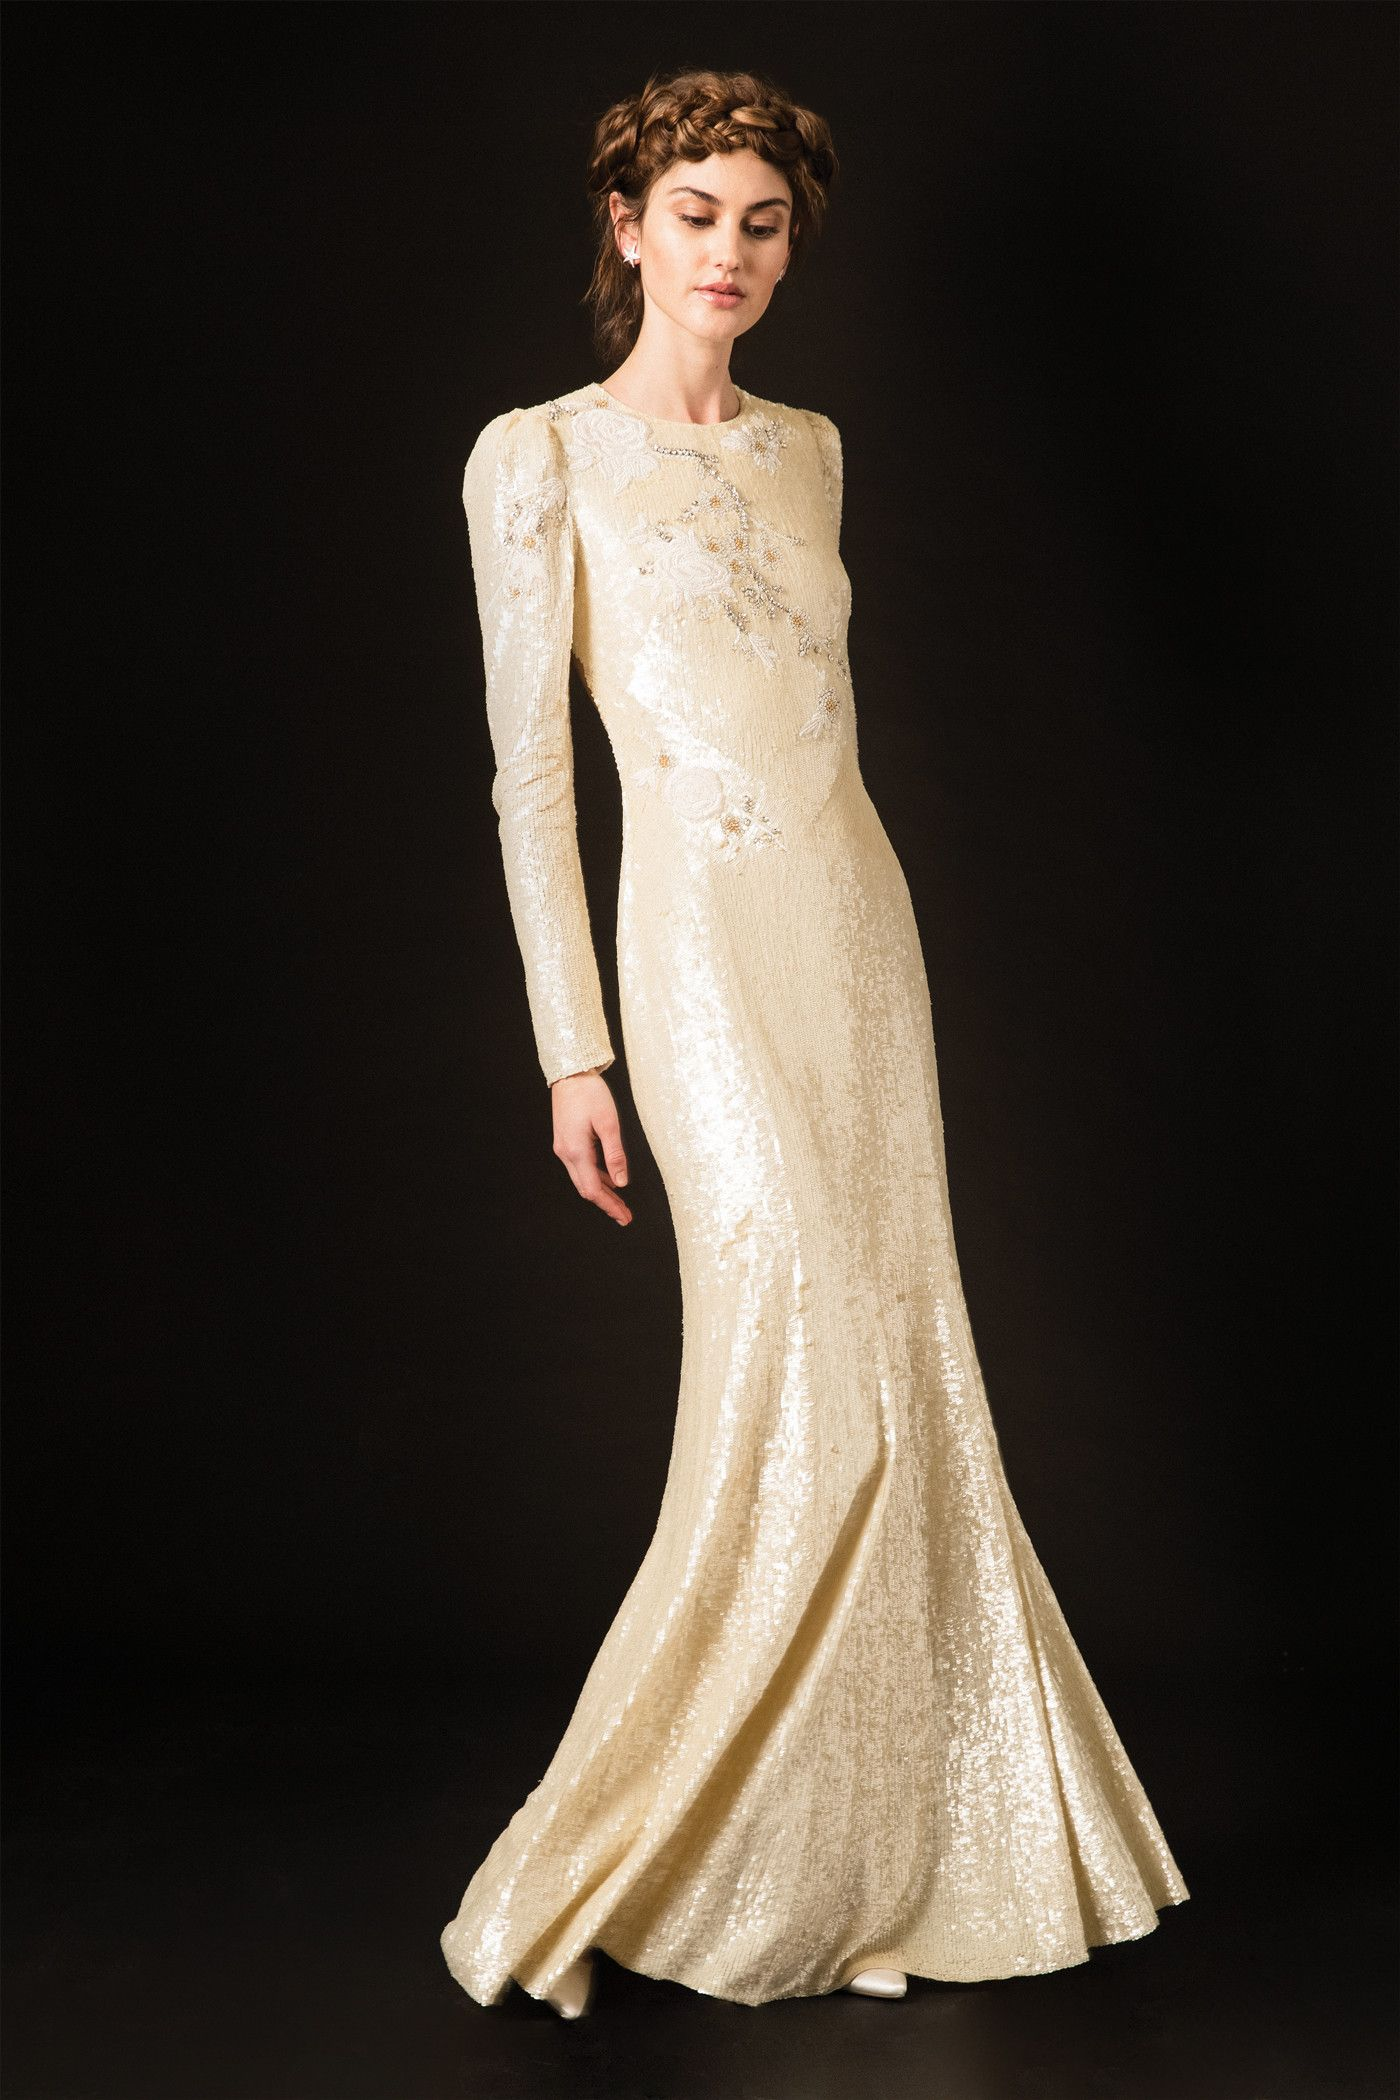 Temperley Bridal Spring 2020 Wedding Dress Collection